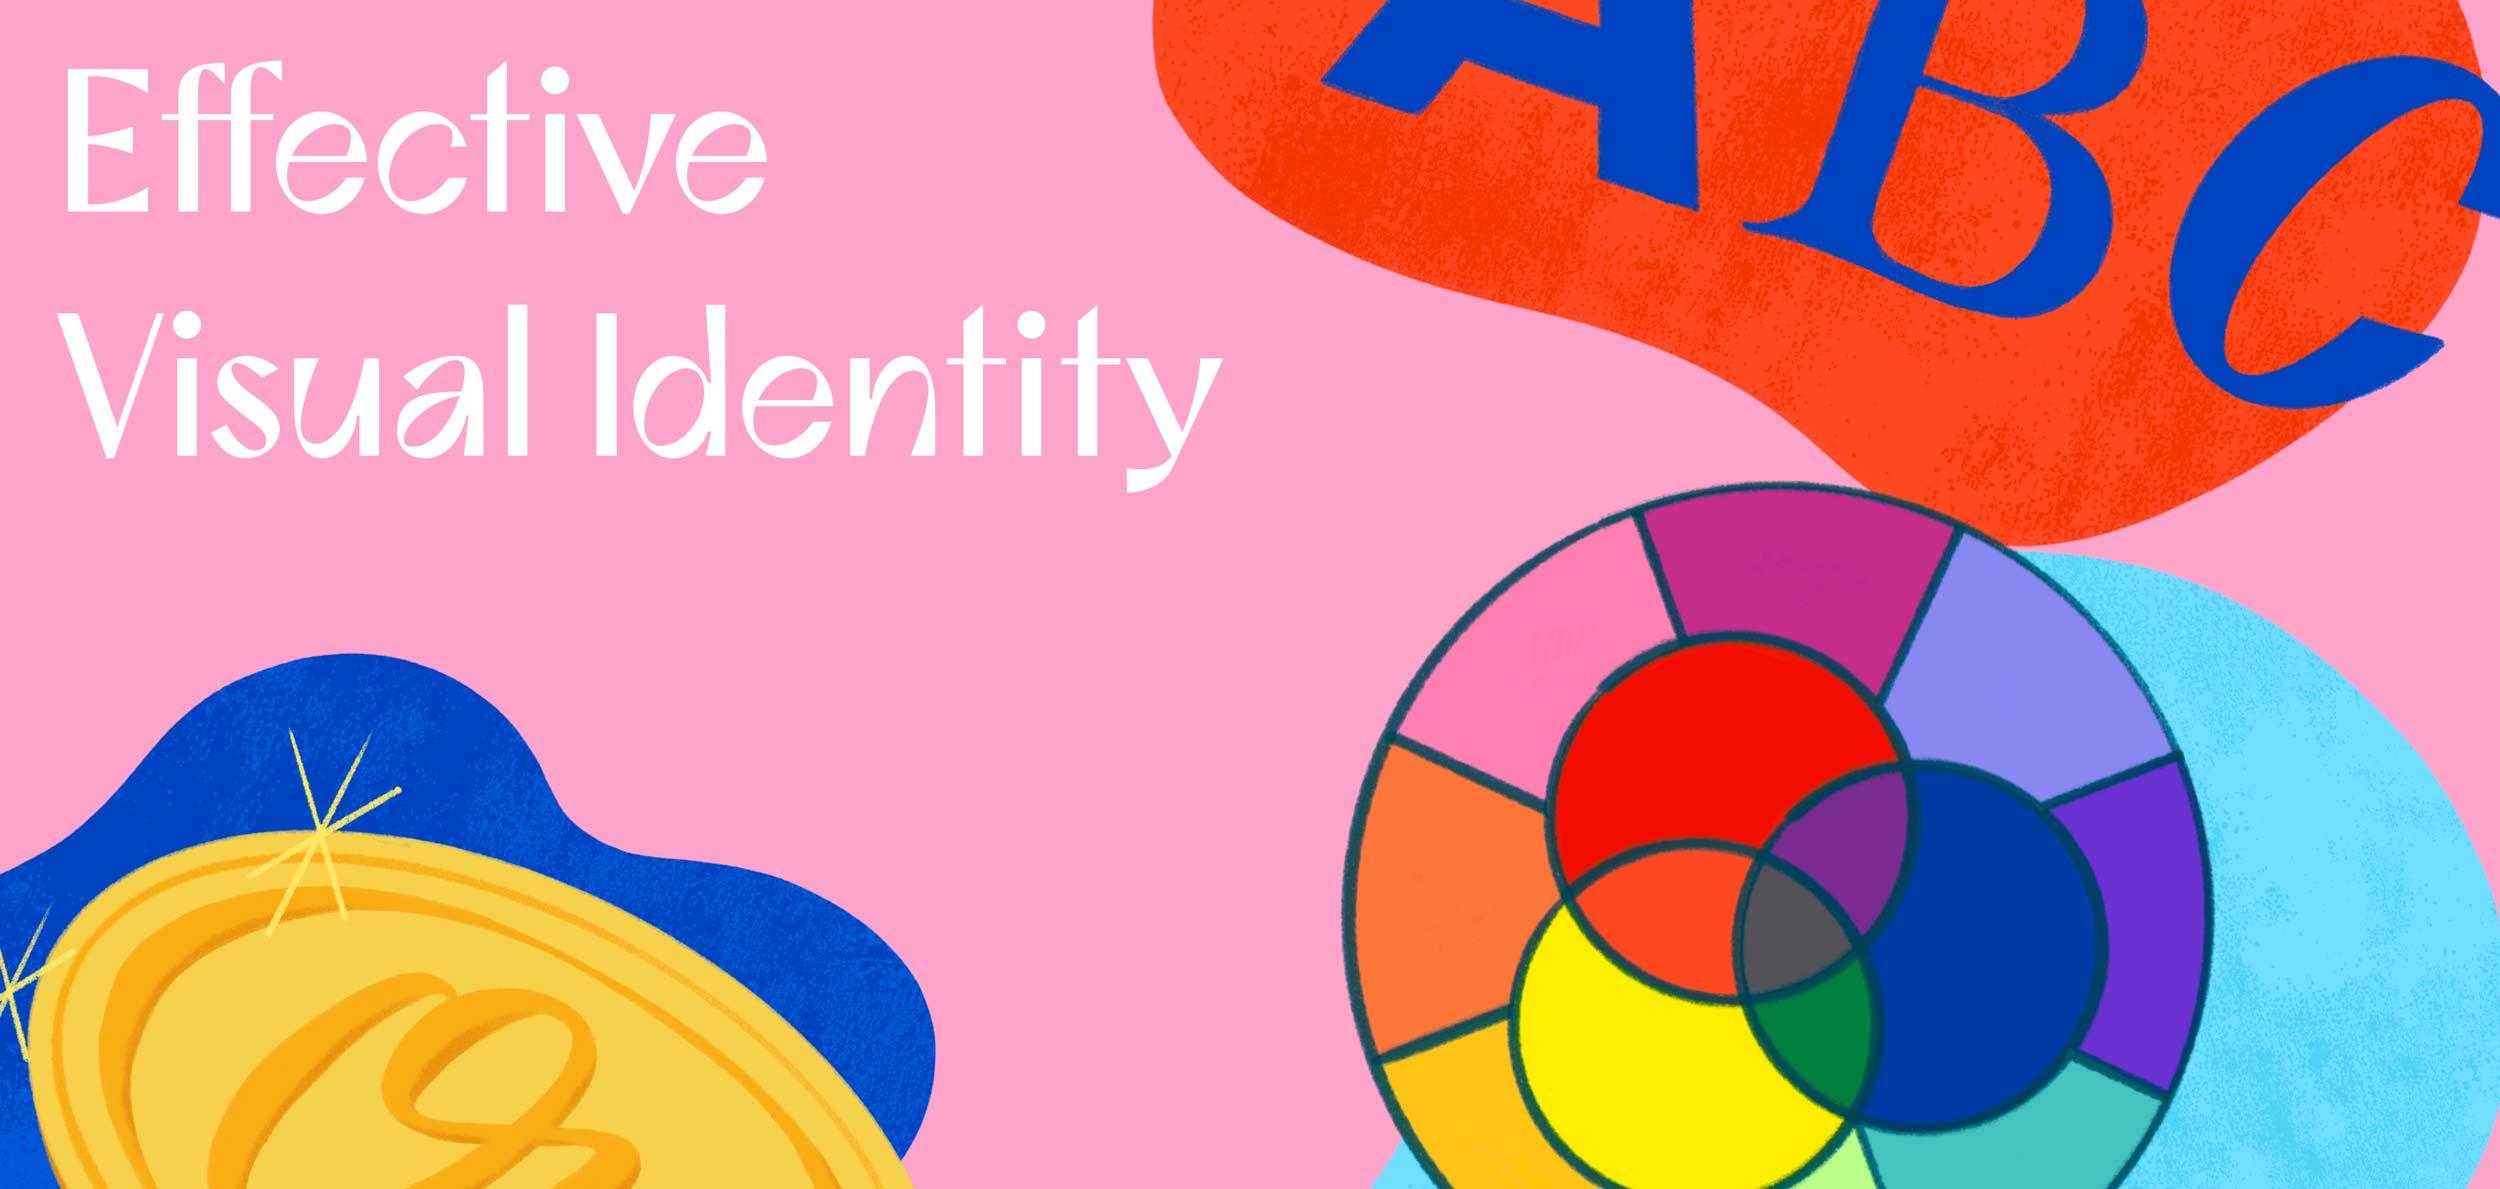 Effective Visual Identity